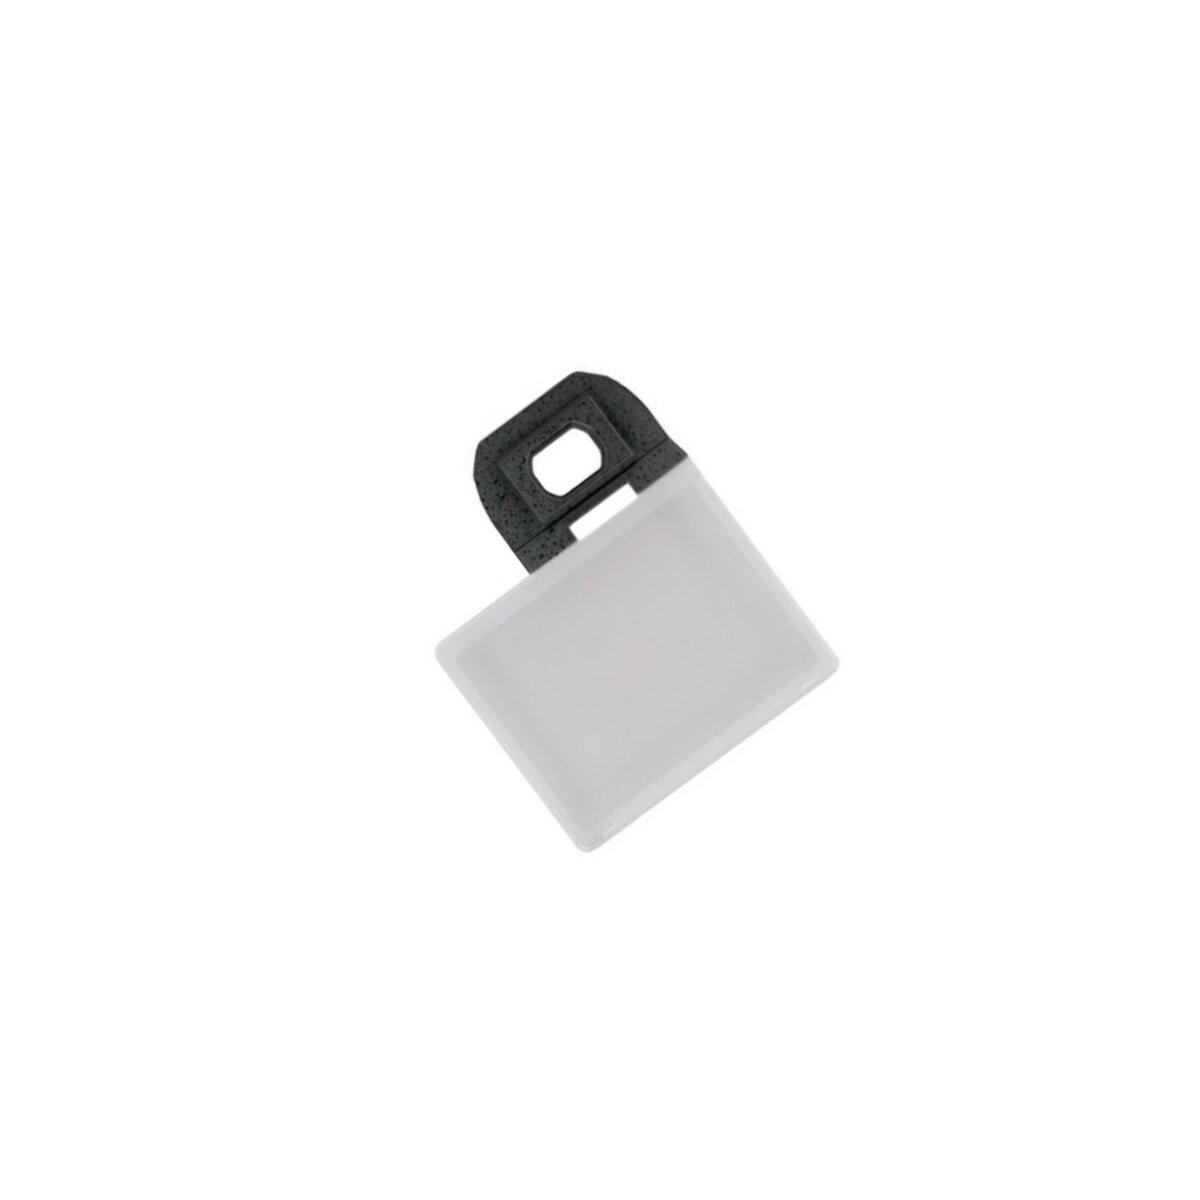 JJC Displayschutz kompatibel mit Canon EOS 500D - LCD ** Monitorschutz - Schutzabdeckung- Cover-…